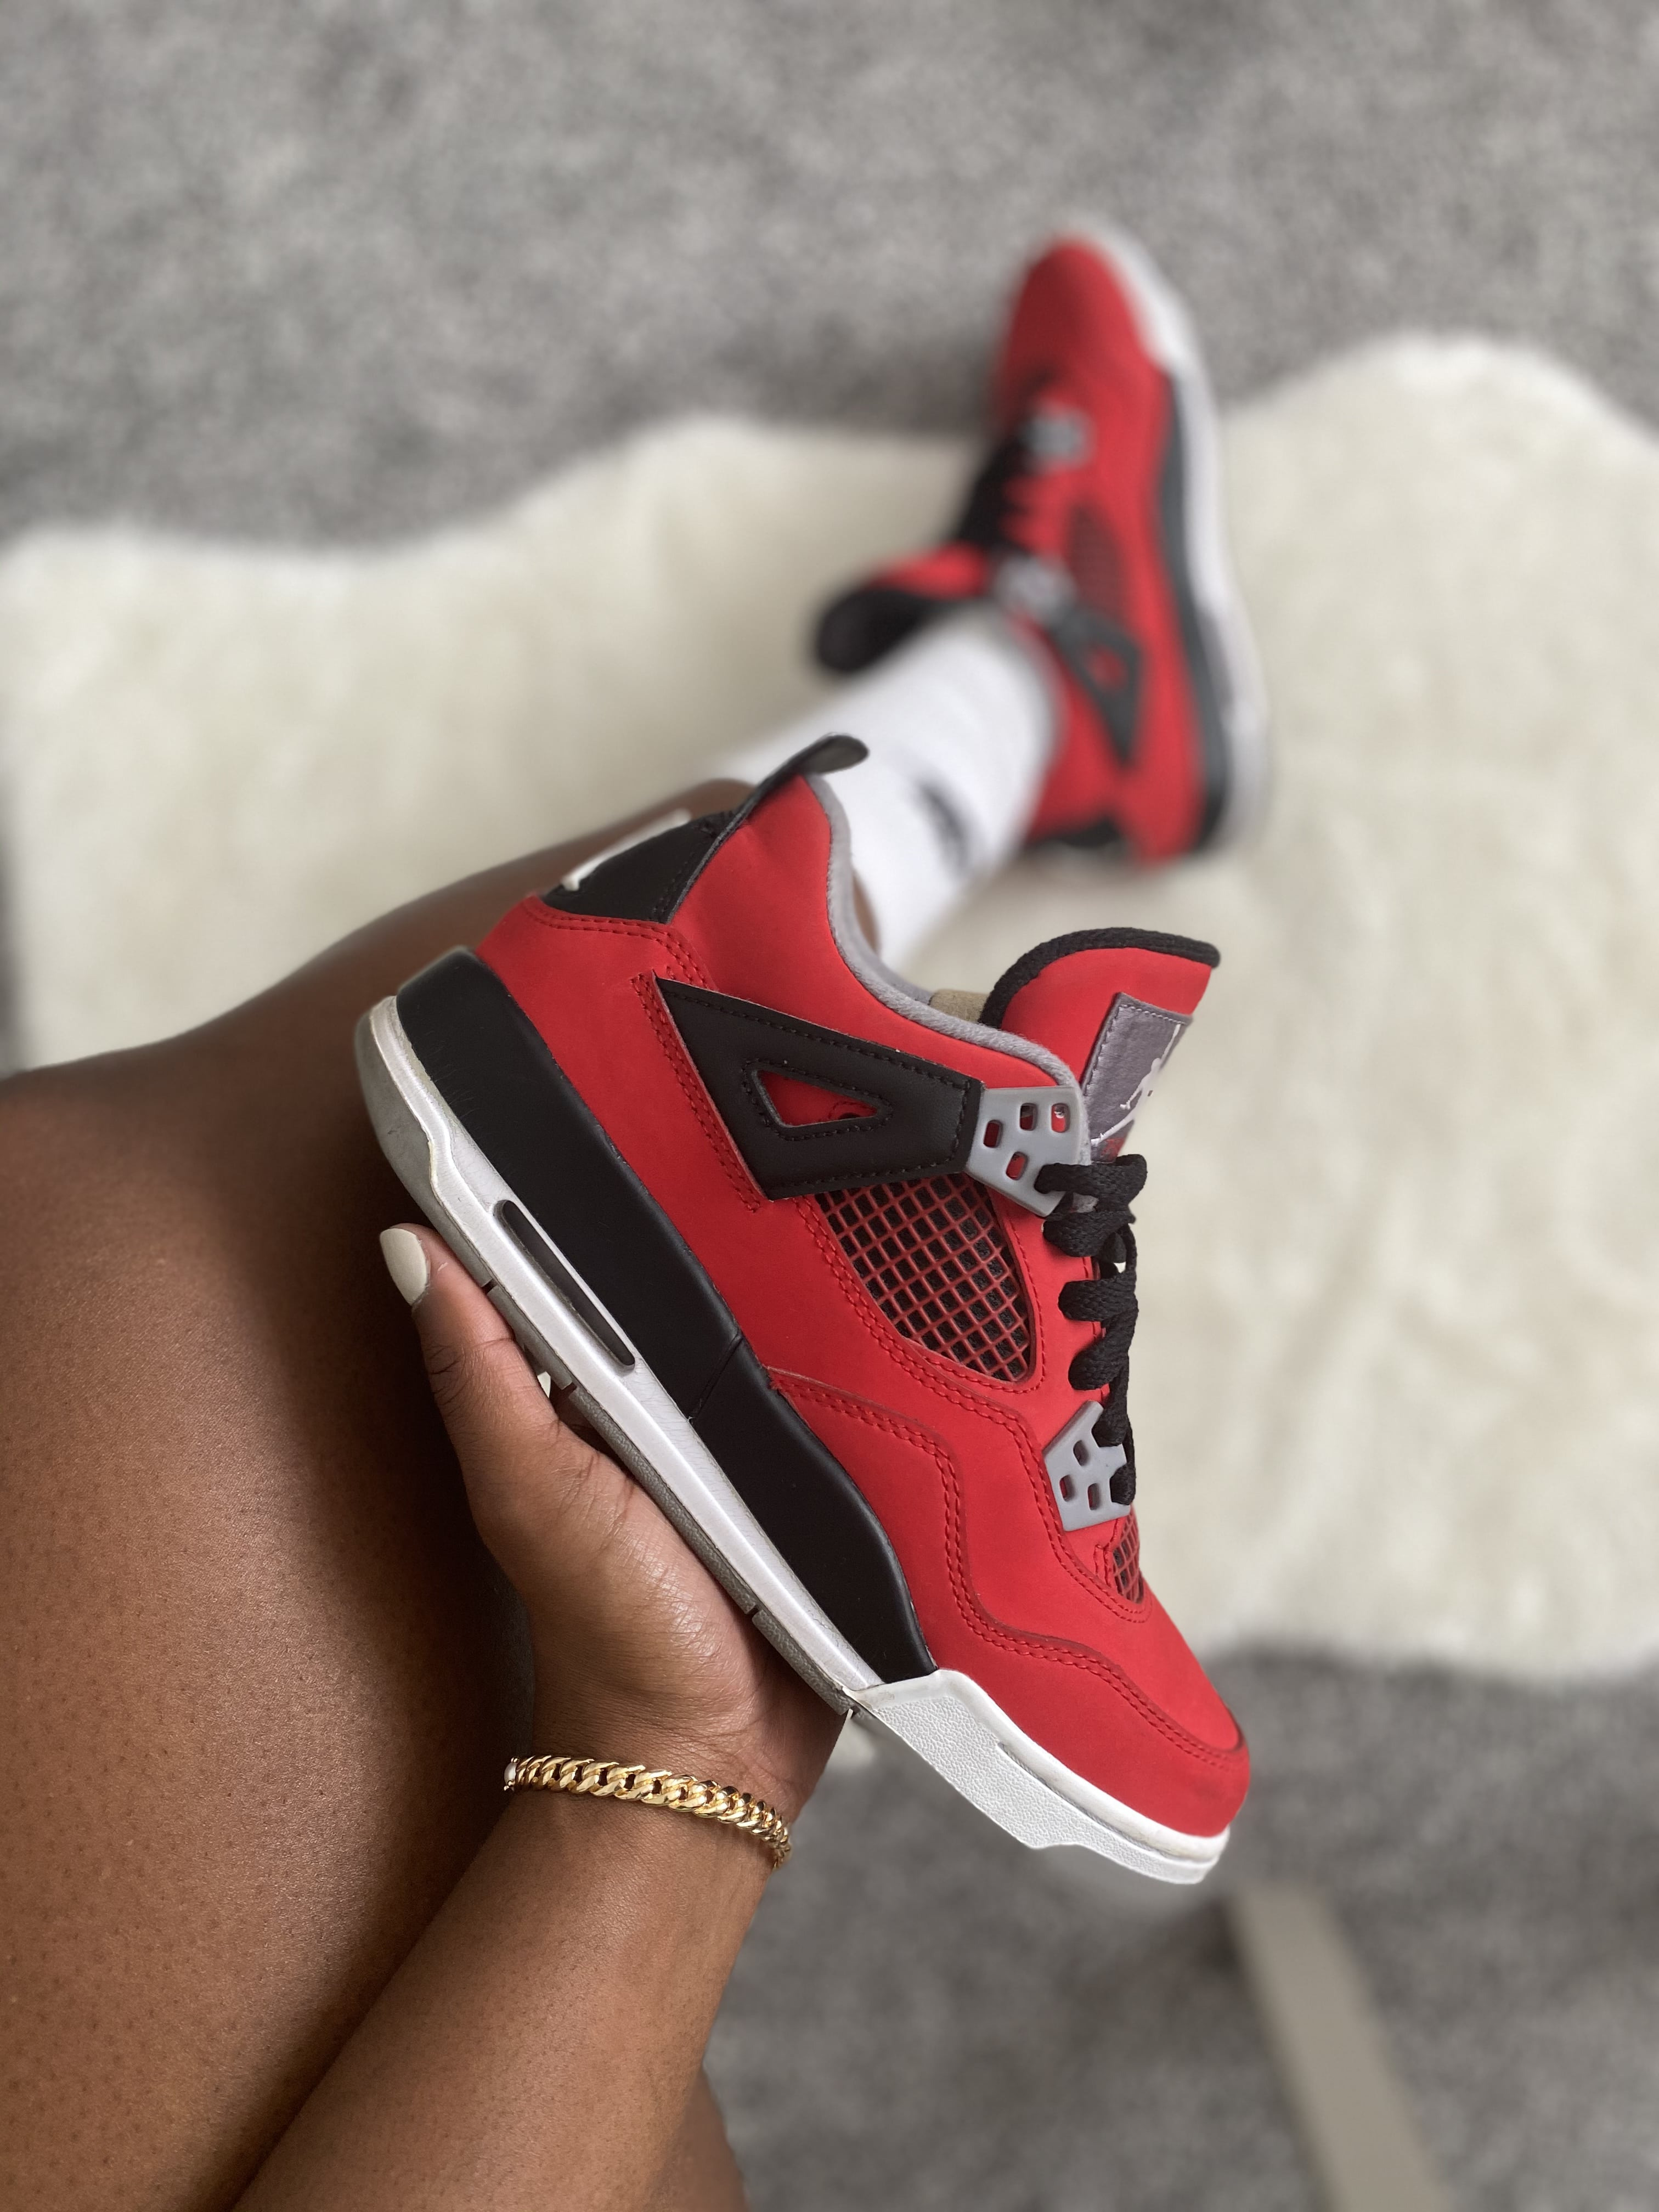 Nike Air Jordan 4 'Toro Bravo' - 2013